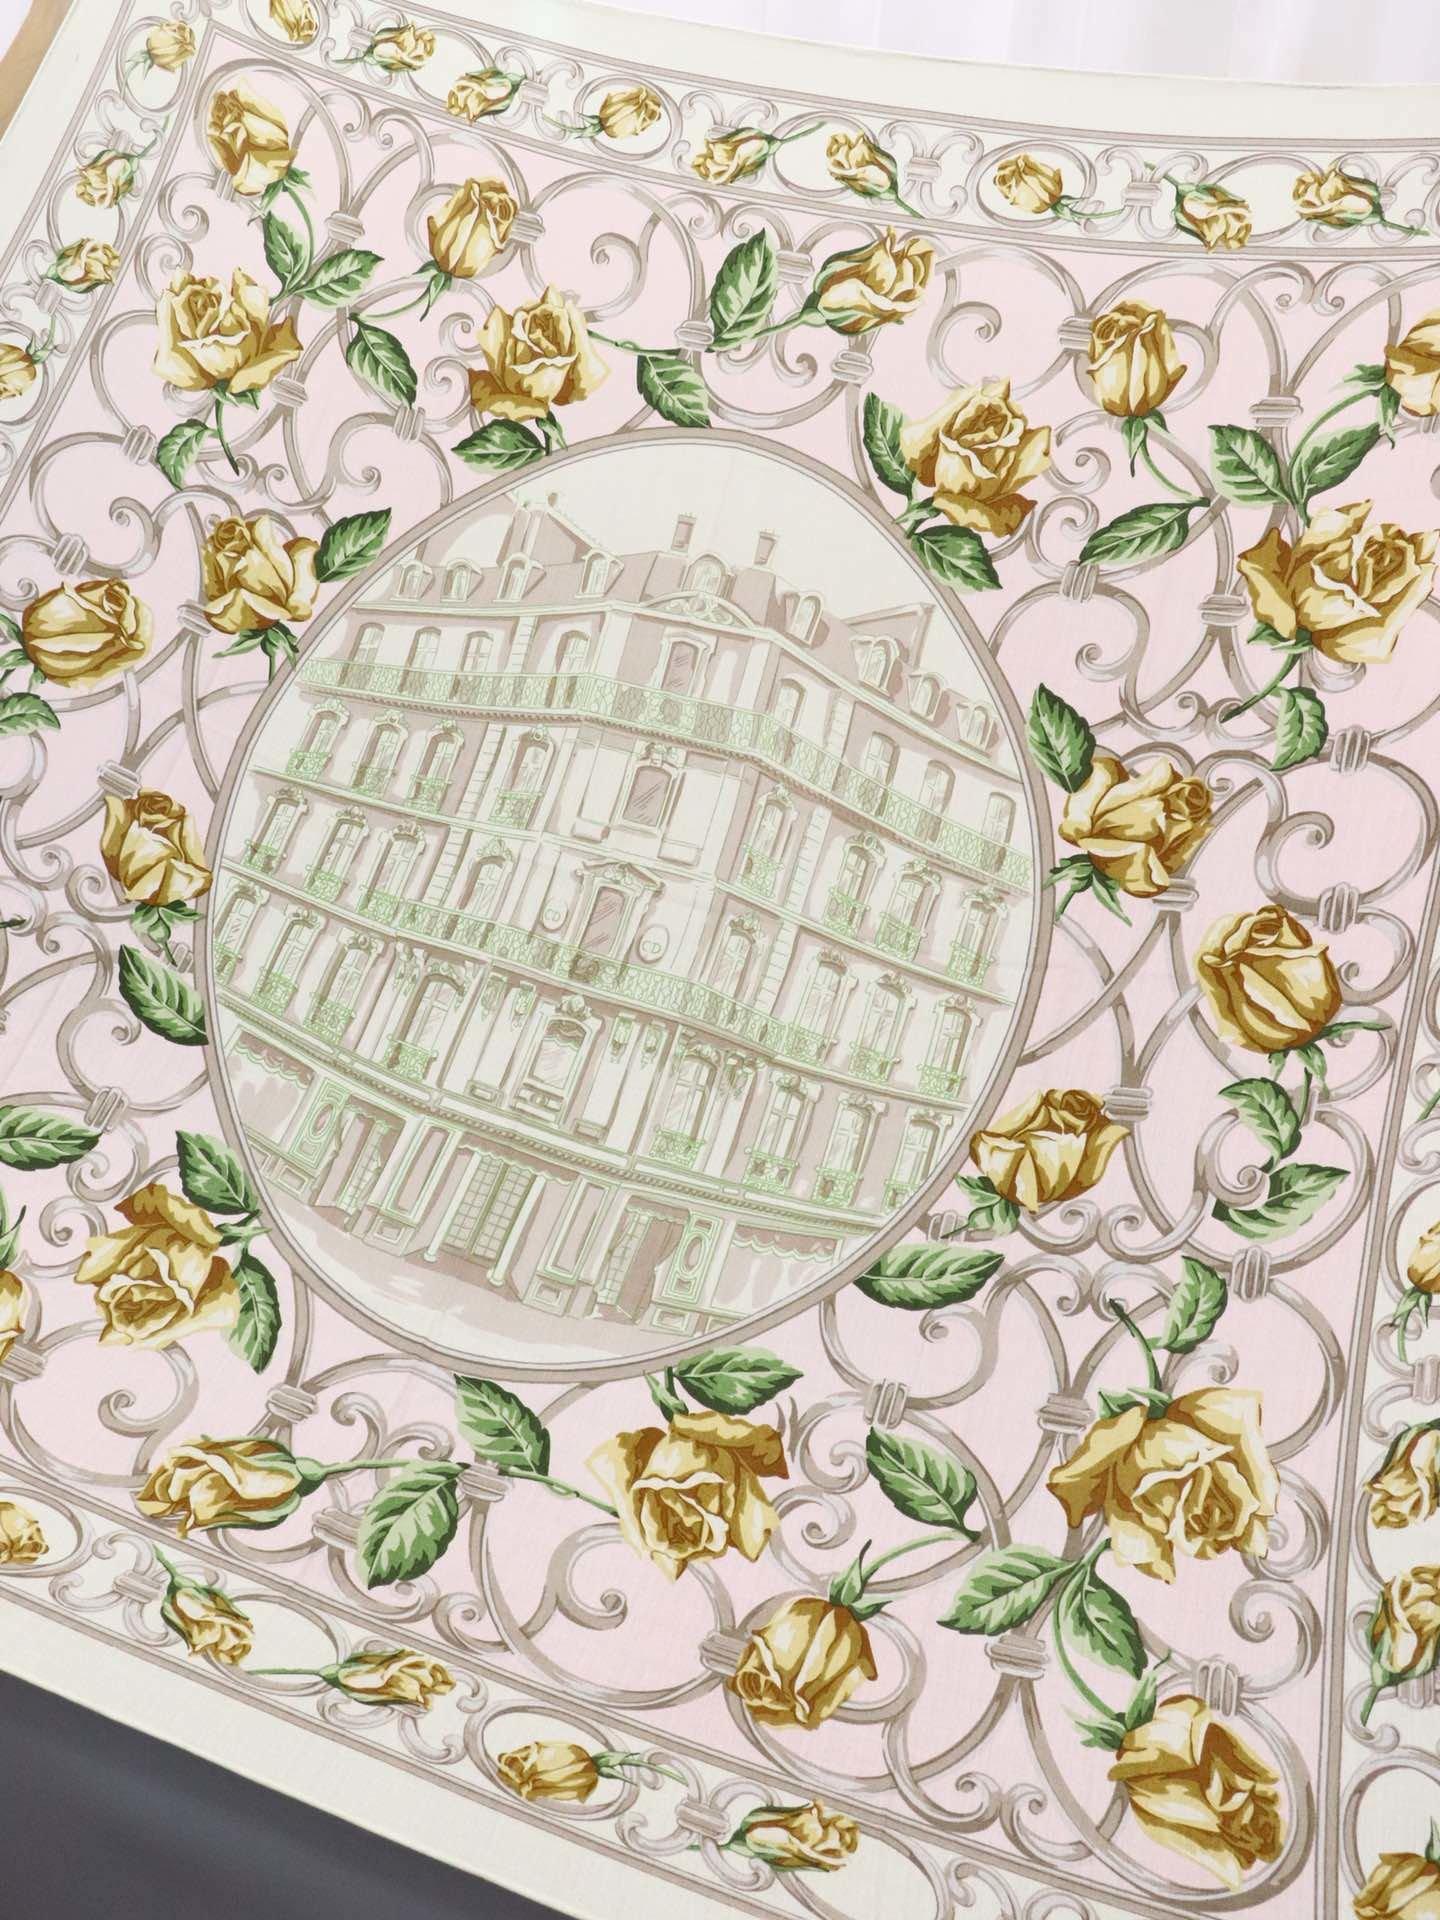 Dior新款丝羊绒方巾花卉风如今可谓